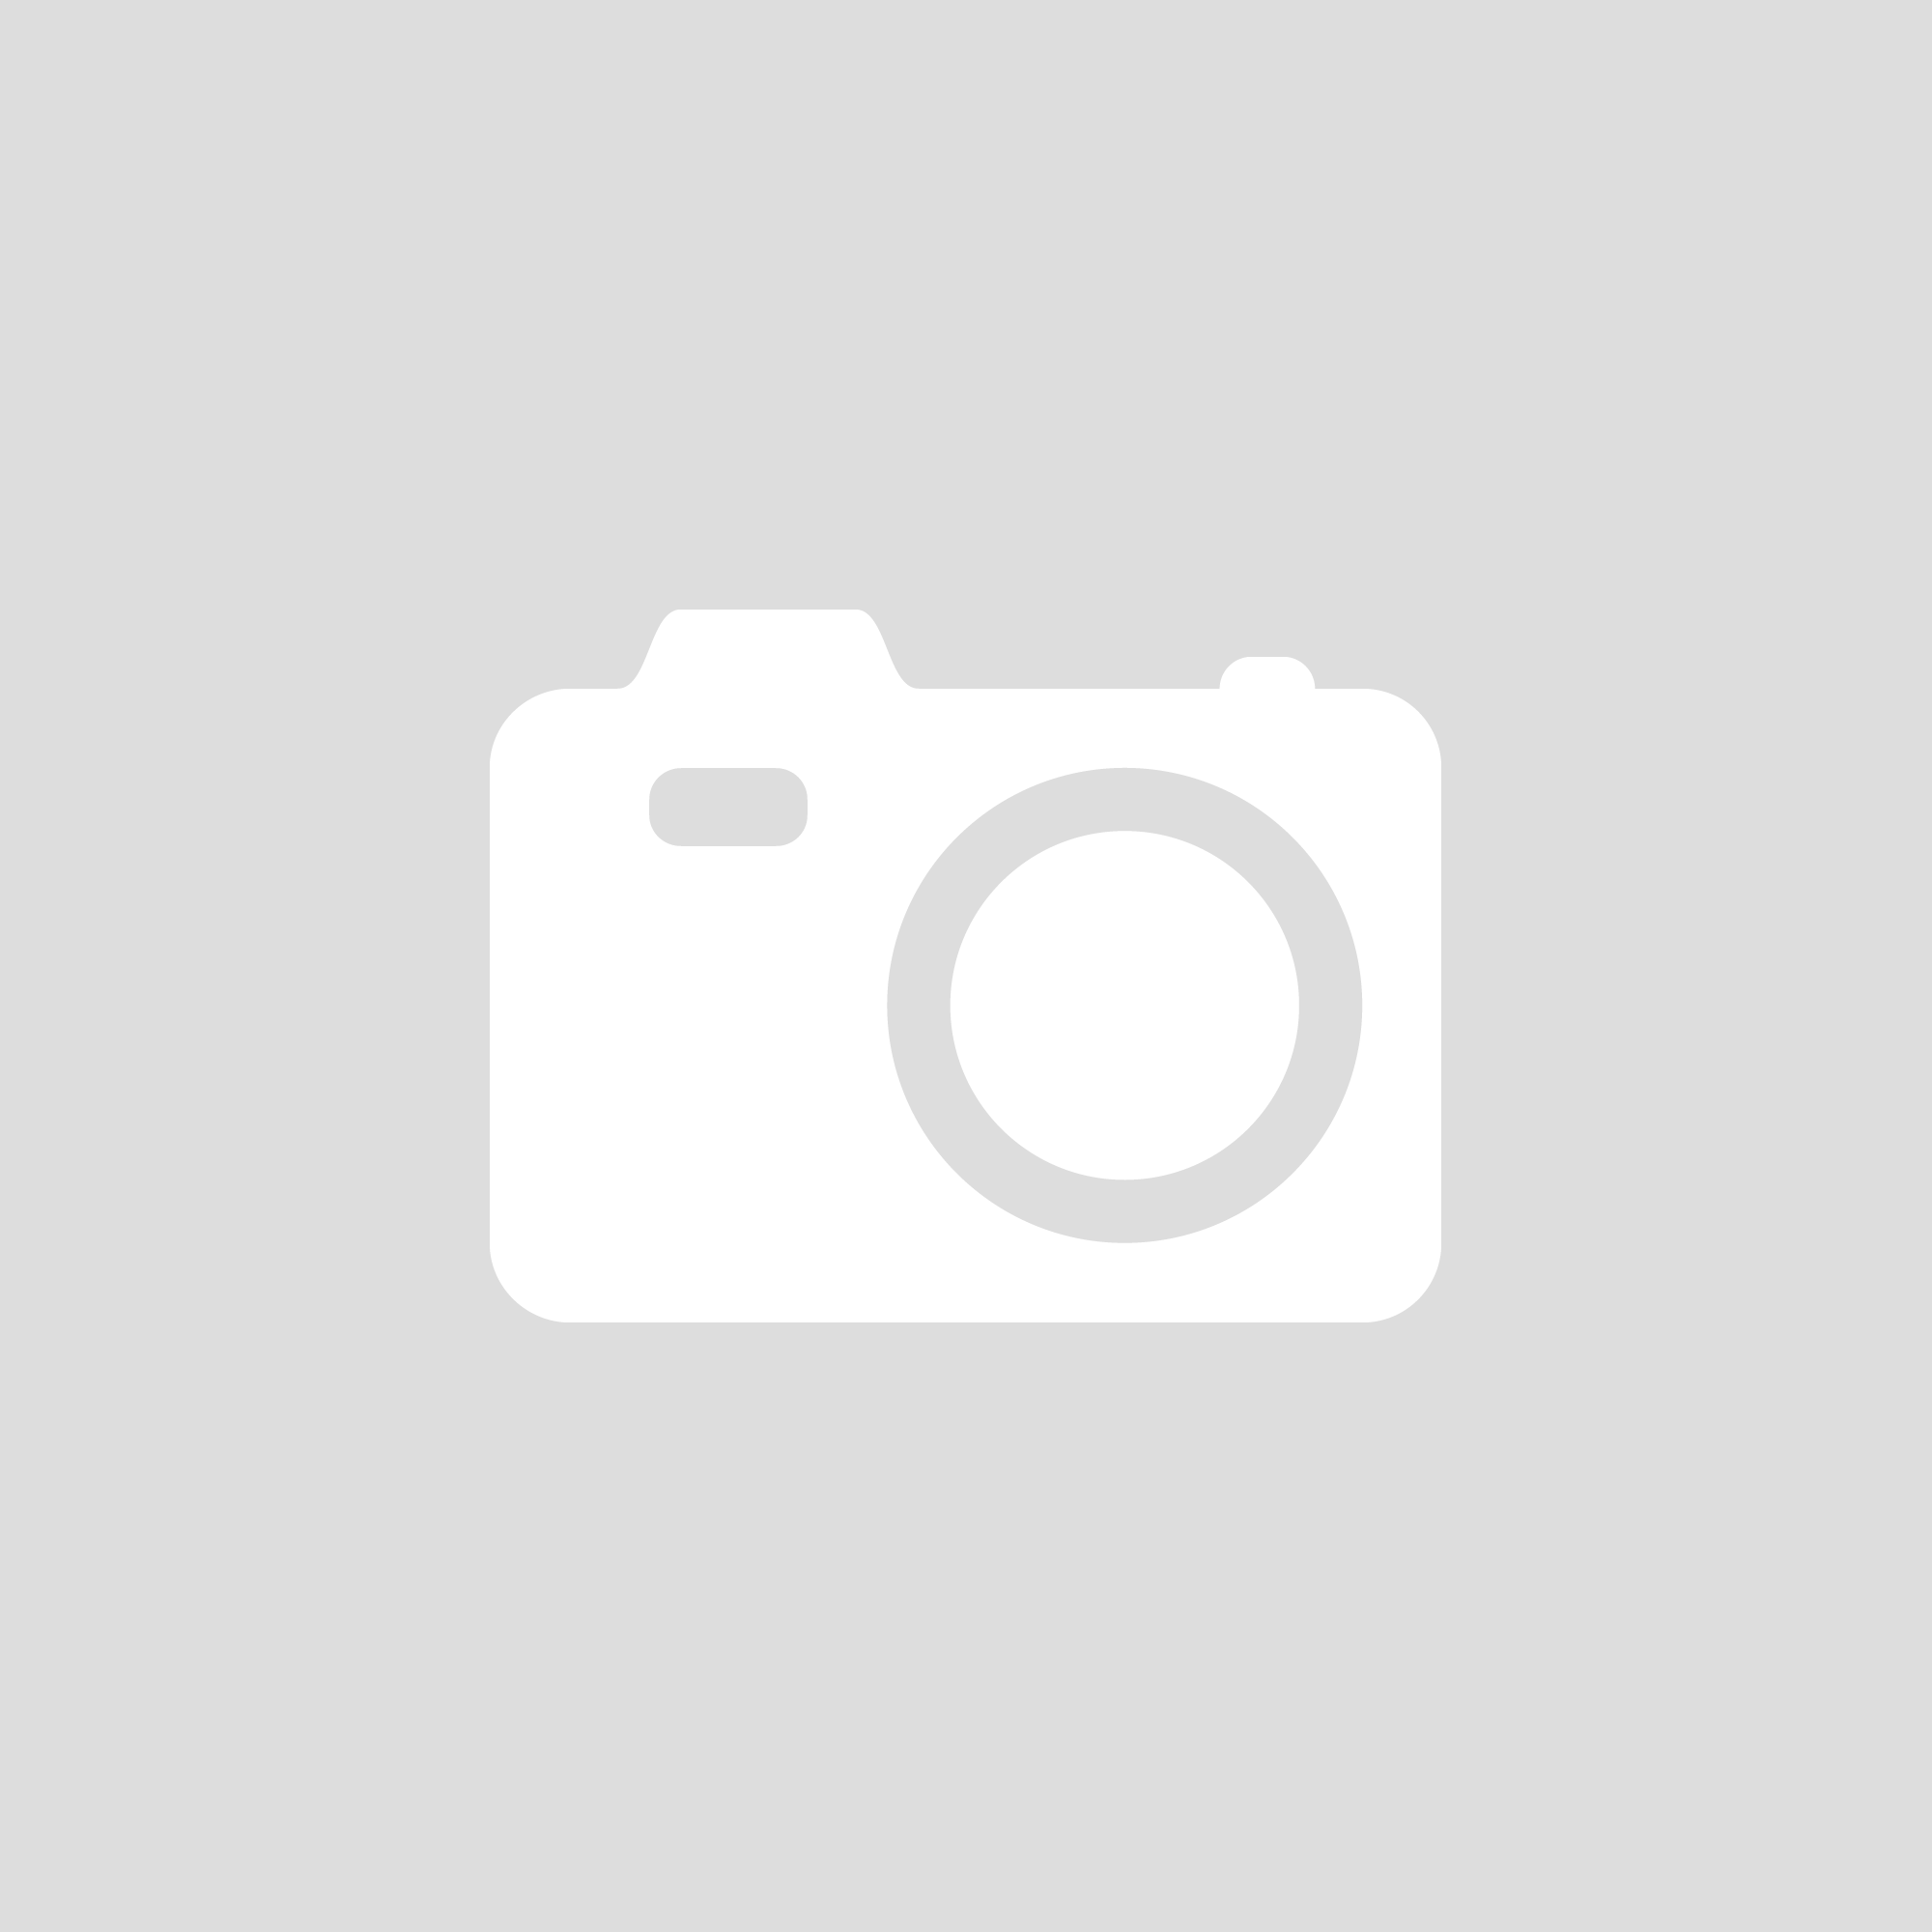 Ruffle Cushion in Teal by CIMC